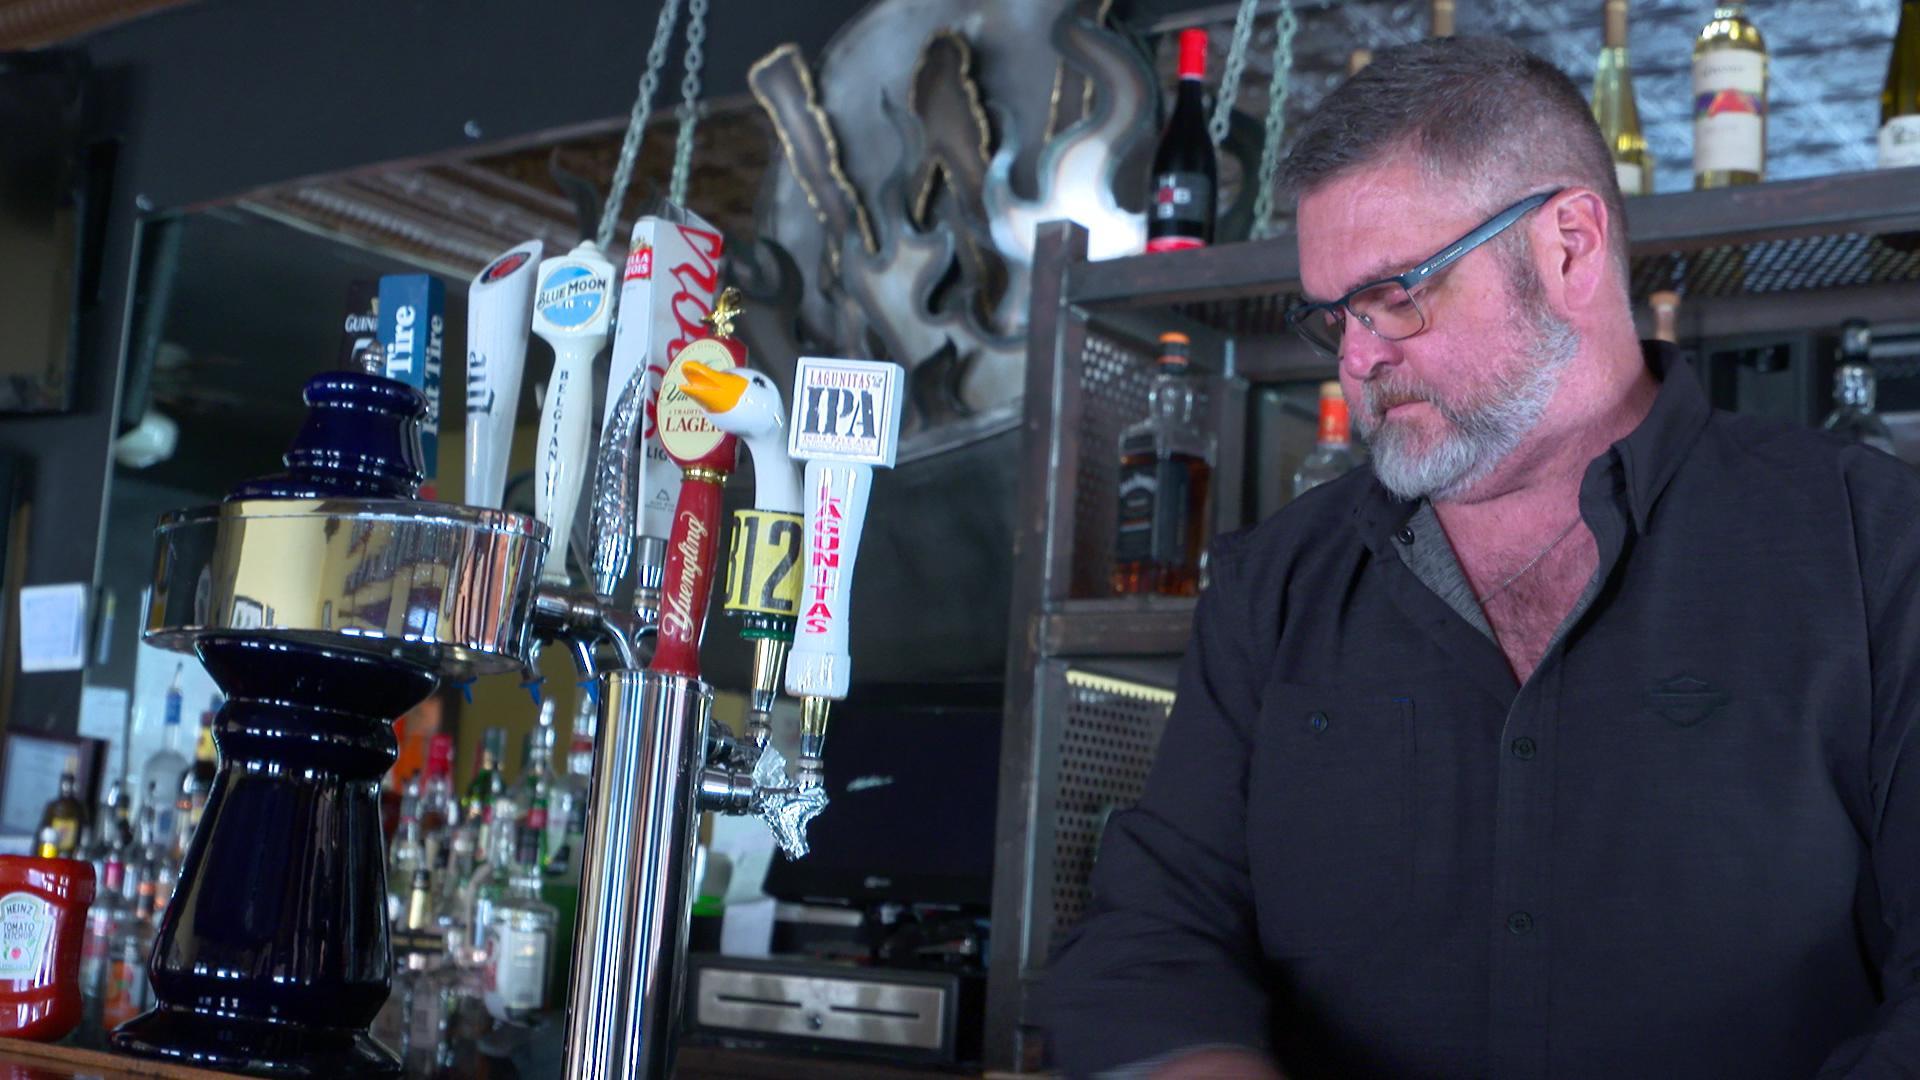 a man looking solemn behind a bar